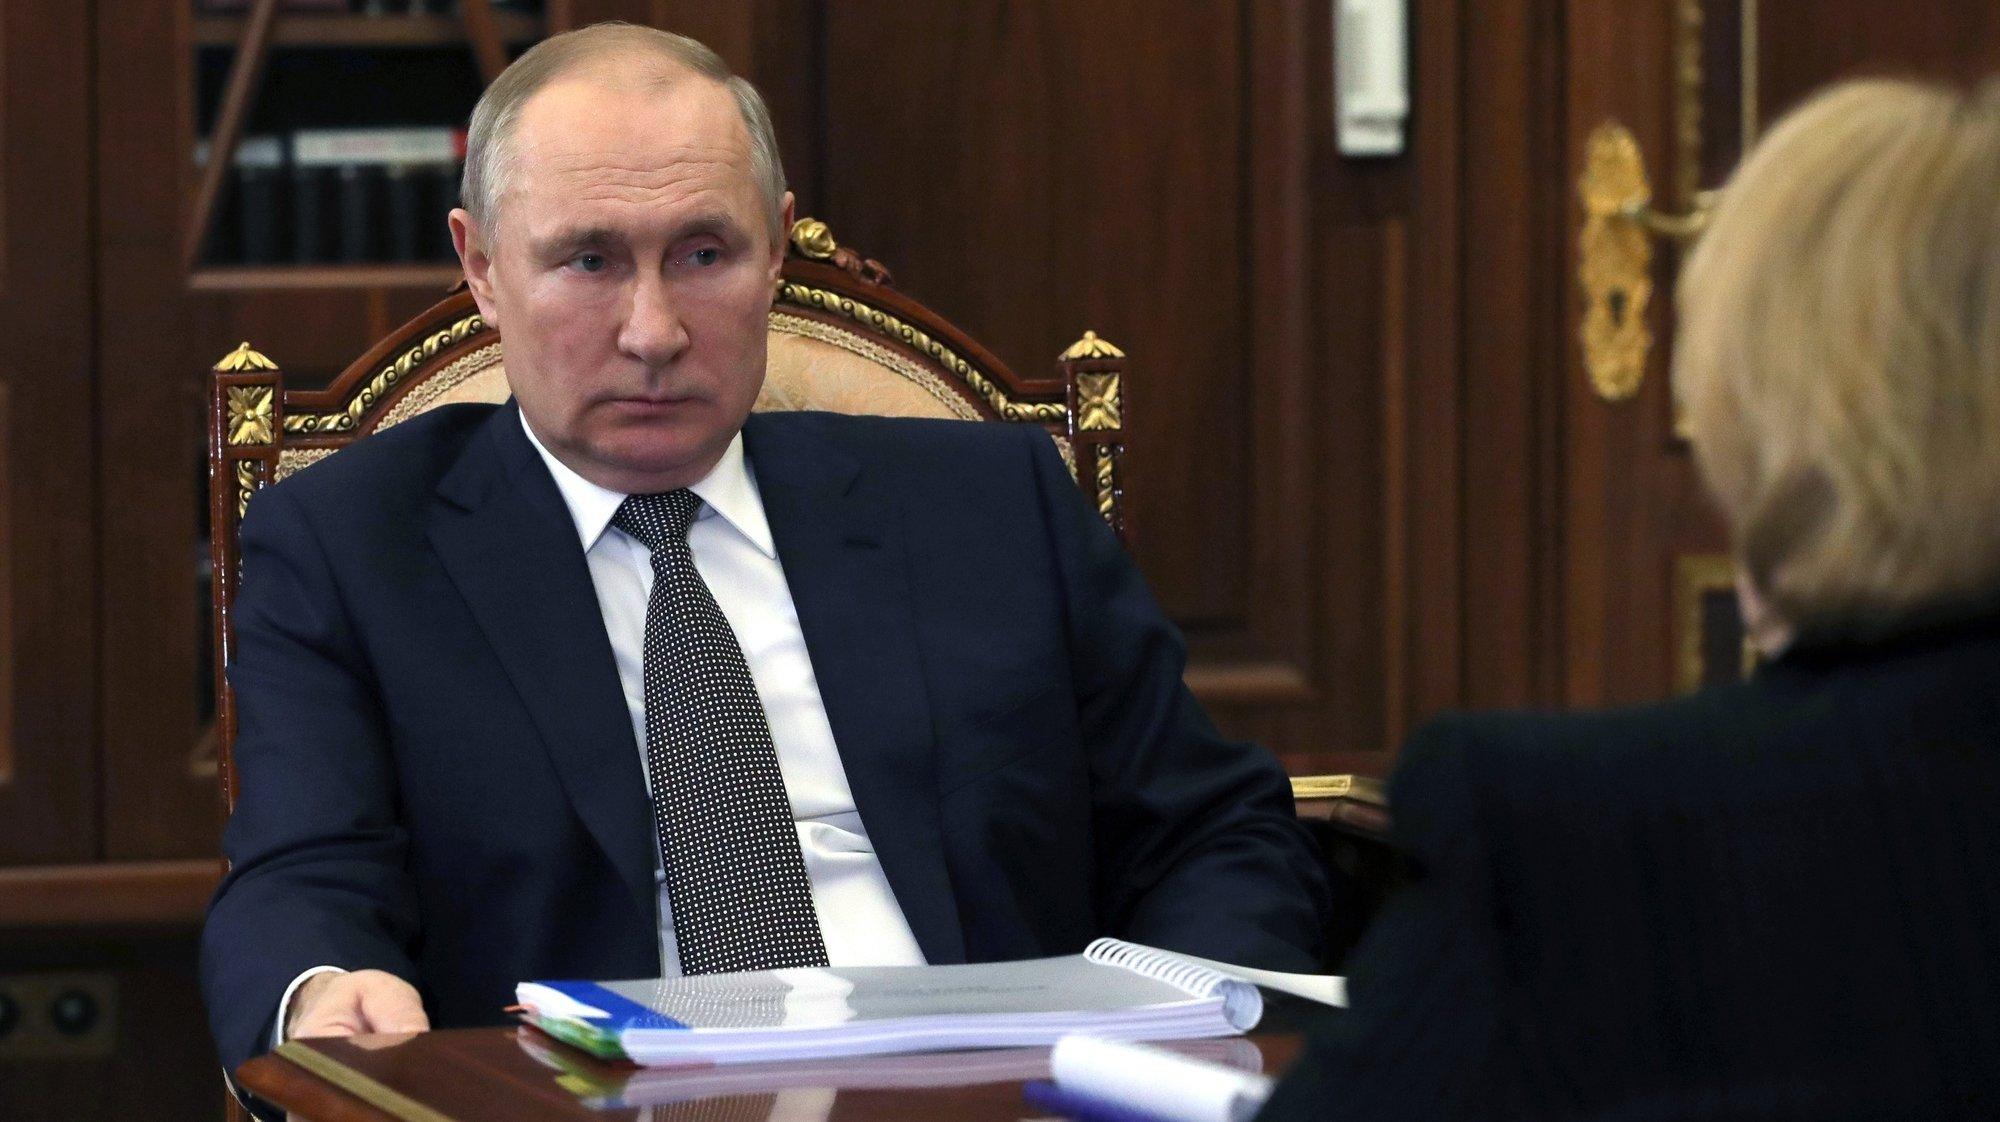 epa09044715 Russian President Vladimir Putin meets with Head of the Russian Federal Biomedical Agency Veronika Skvortsova, in Moscow, Russia, 01 March 2021.  EPA/ALEXEI DRUZHININ/SPUTNIK/KREMLIN / POOL MANDATORY CREDIT